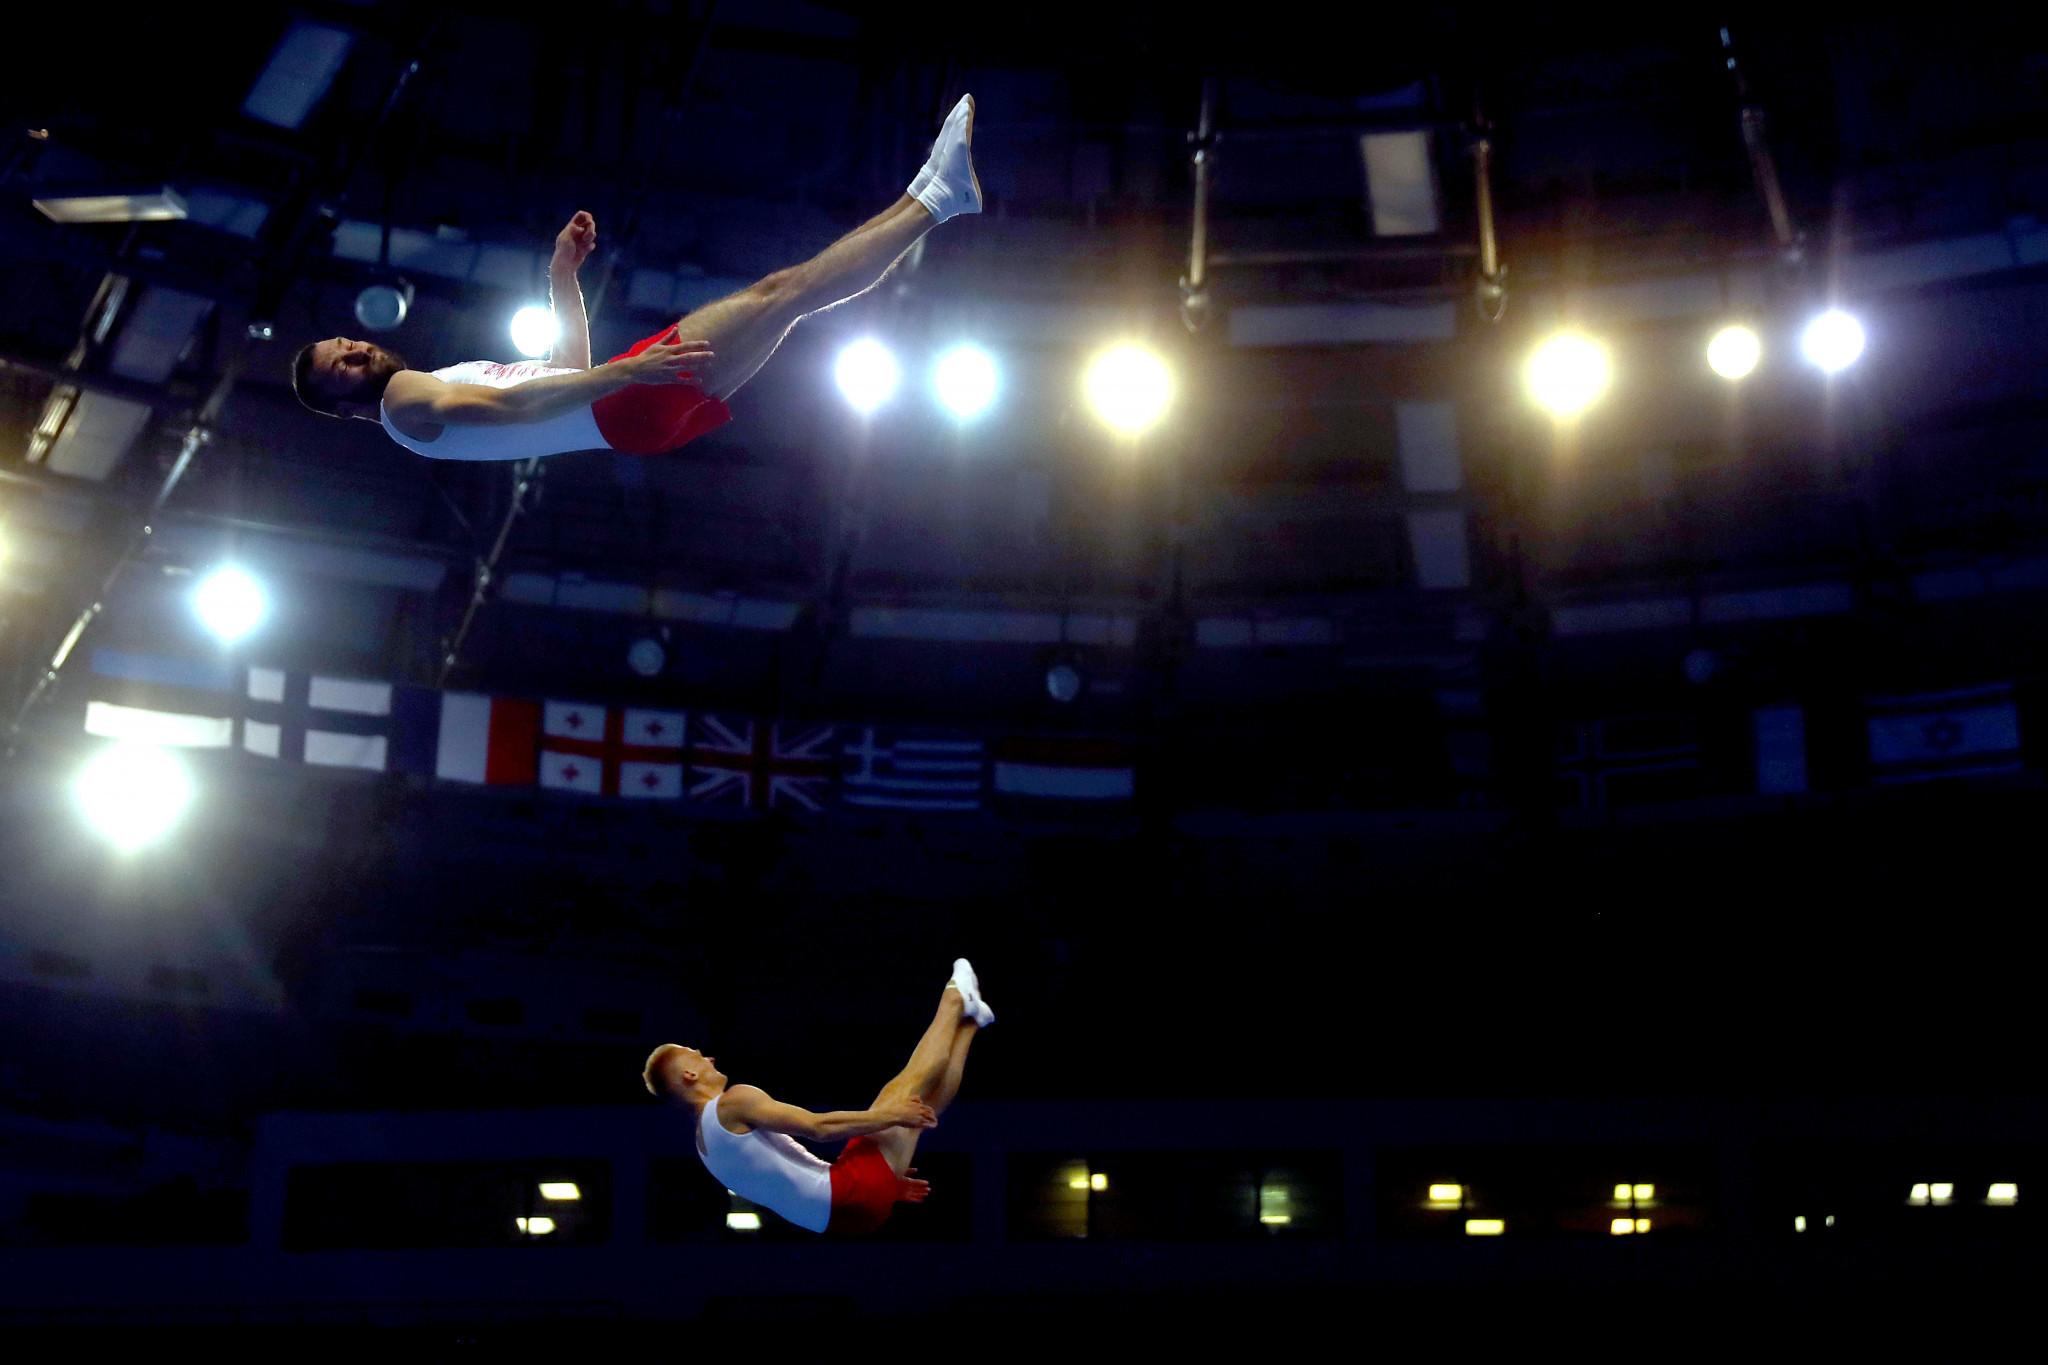 Polish pair strike gold as trampoline gymnastics begins at Minsk 2019